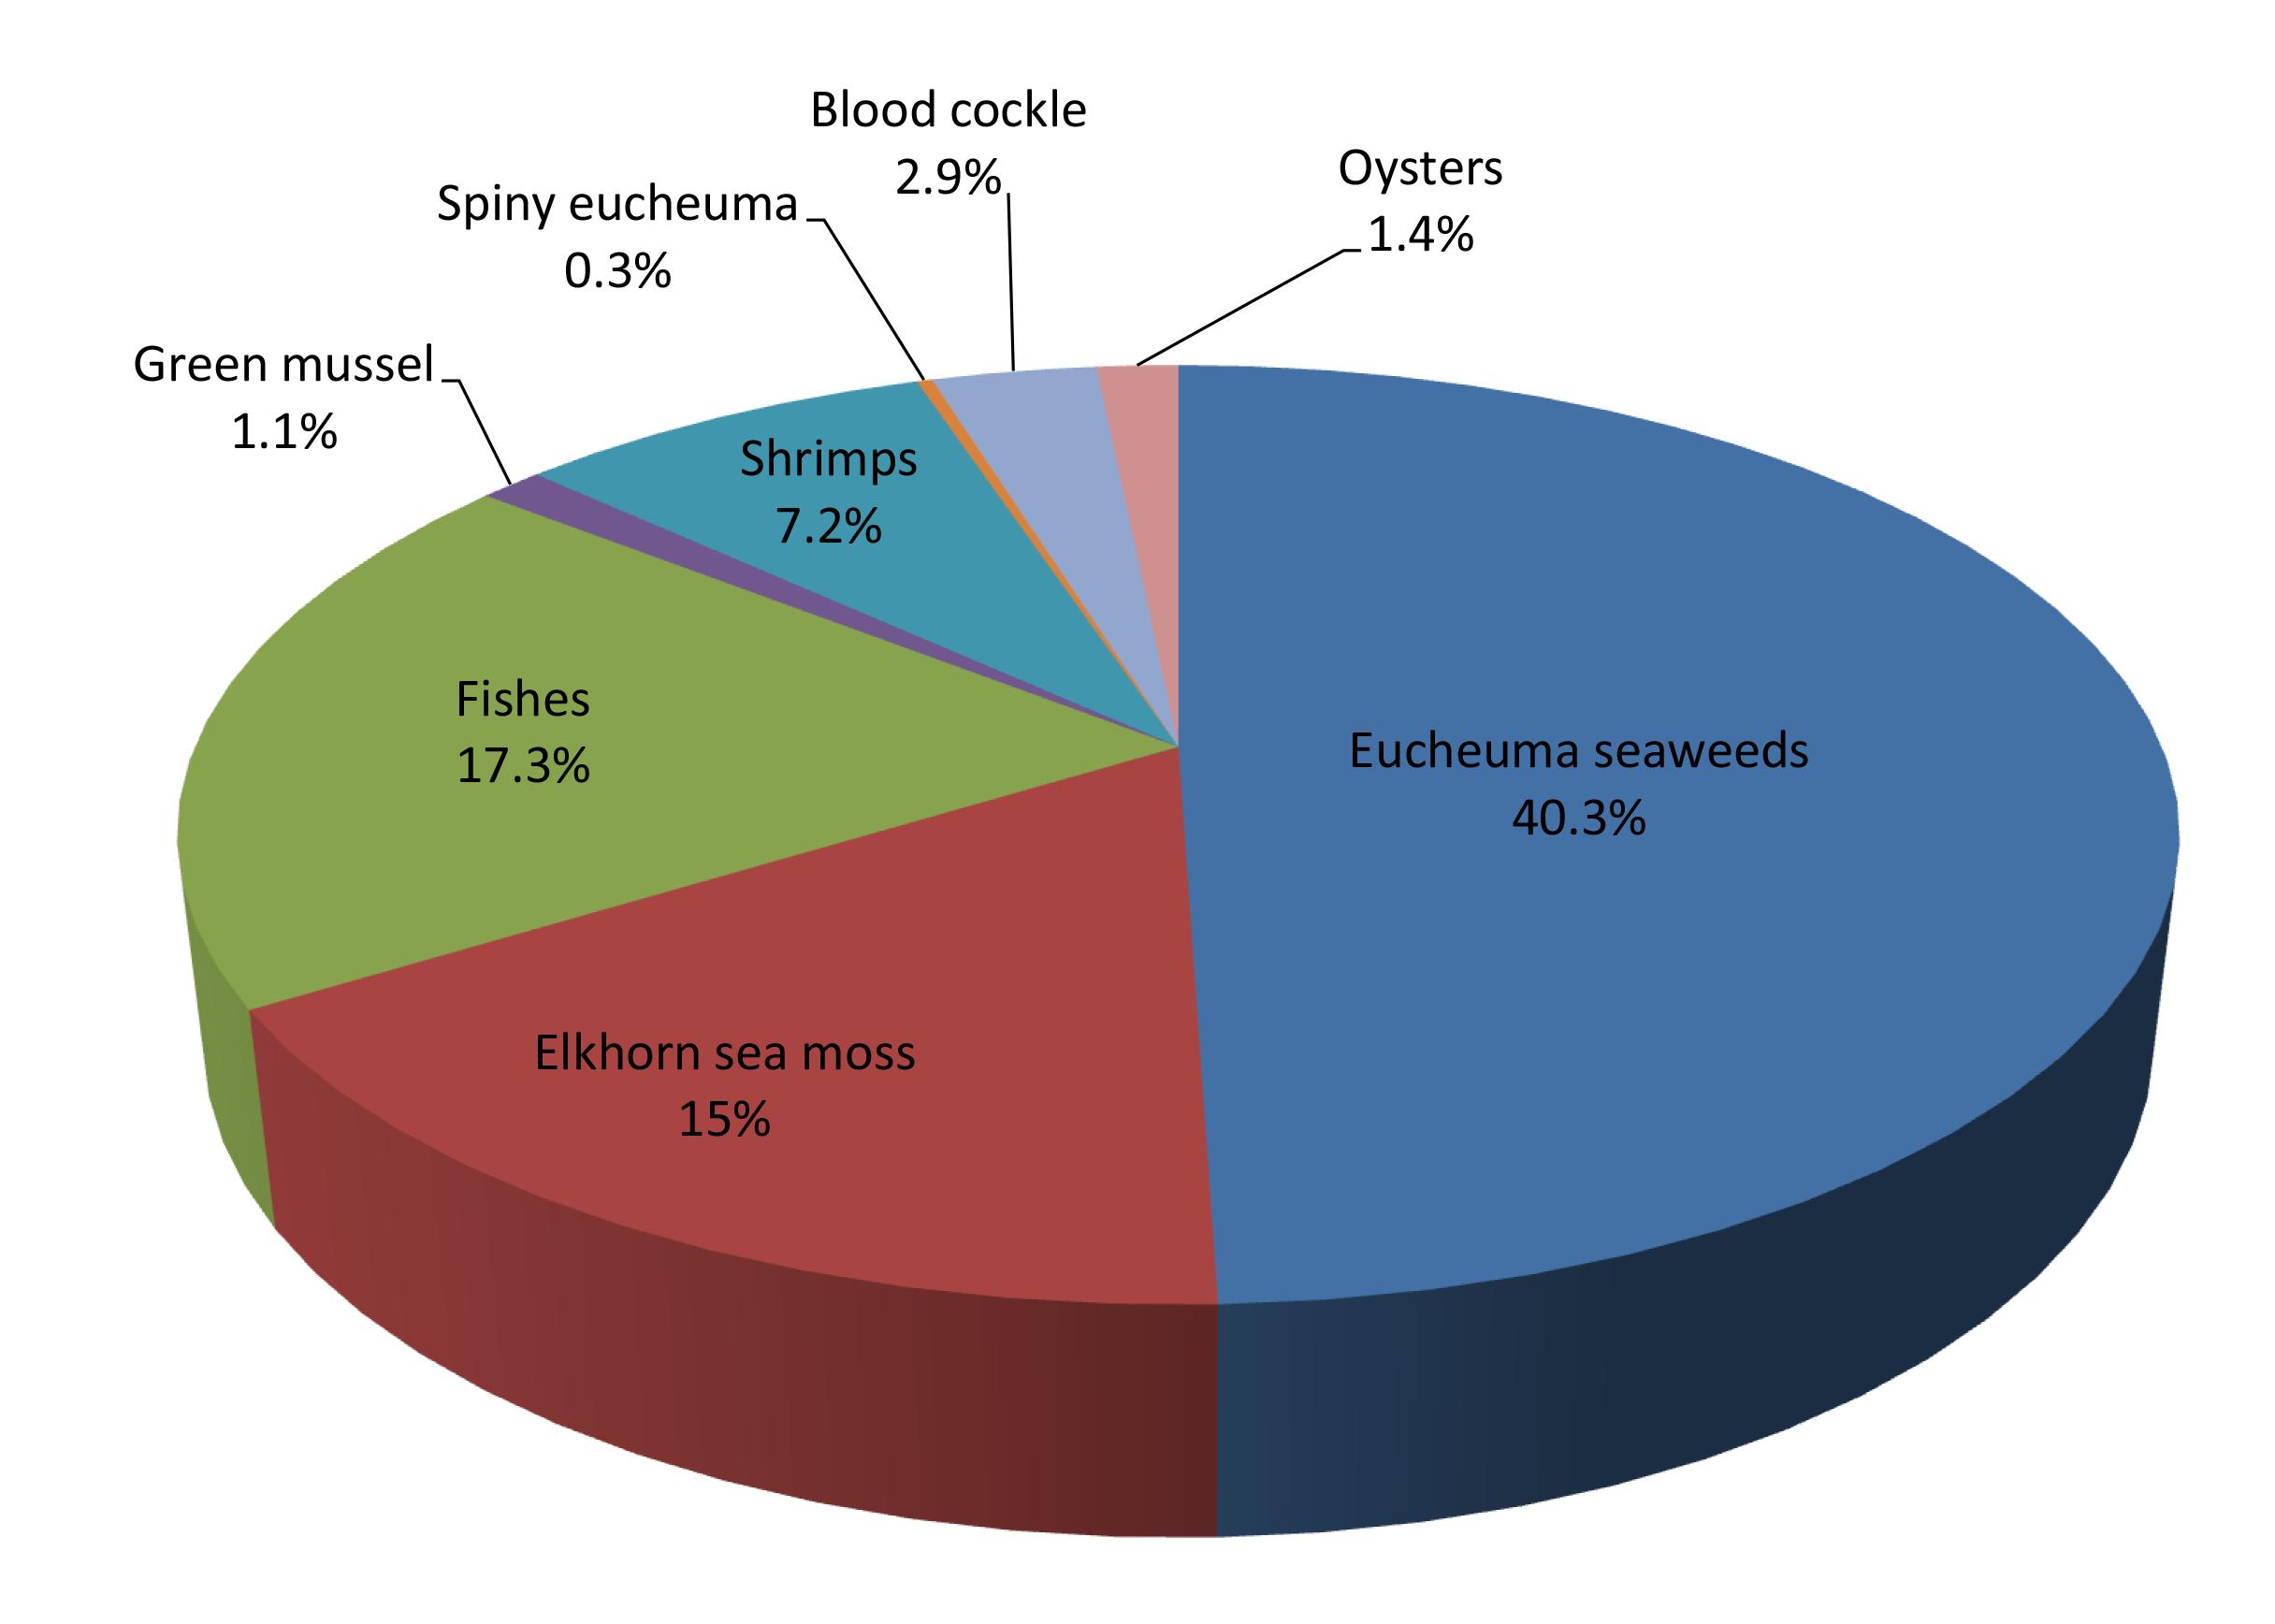 Fishery statistics summary 2014 seafdec nvjuhfo Image collections